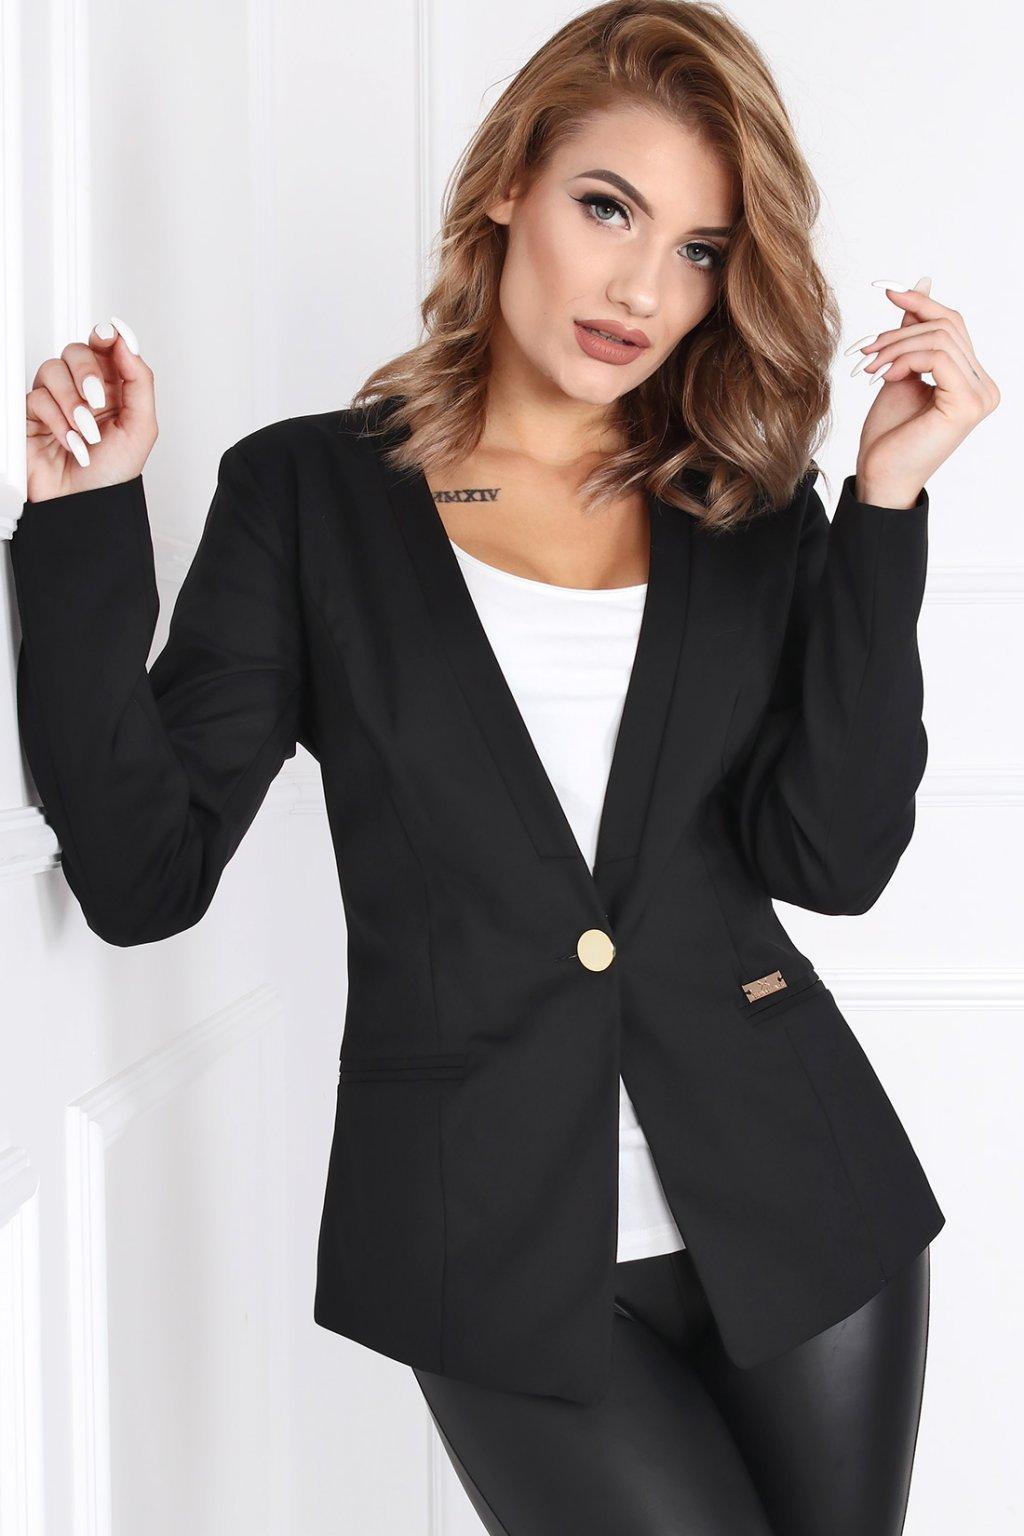 Dámske elegantné sako Melody čierne